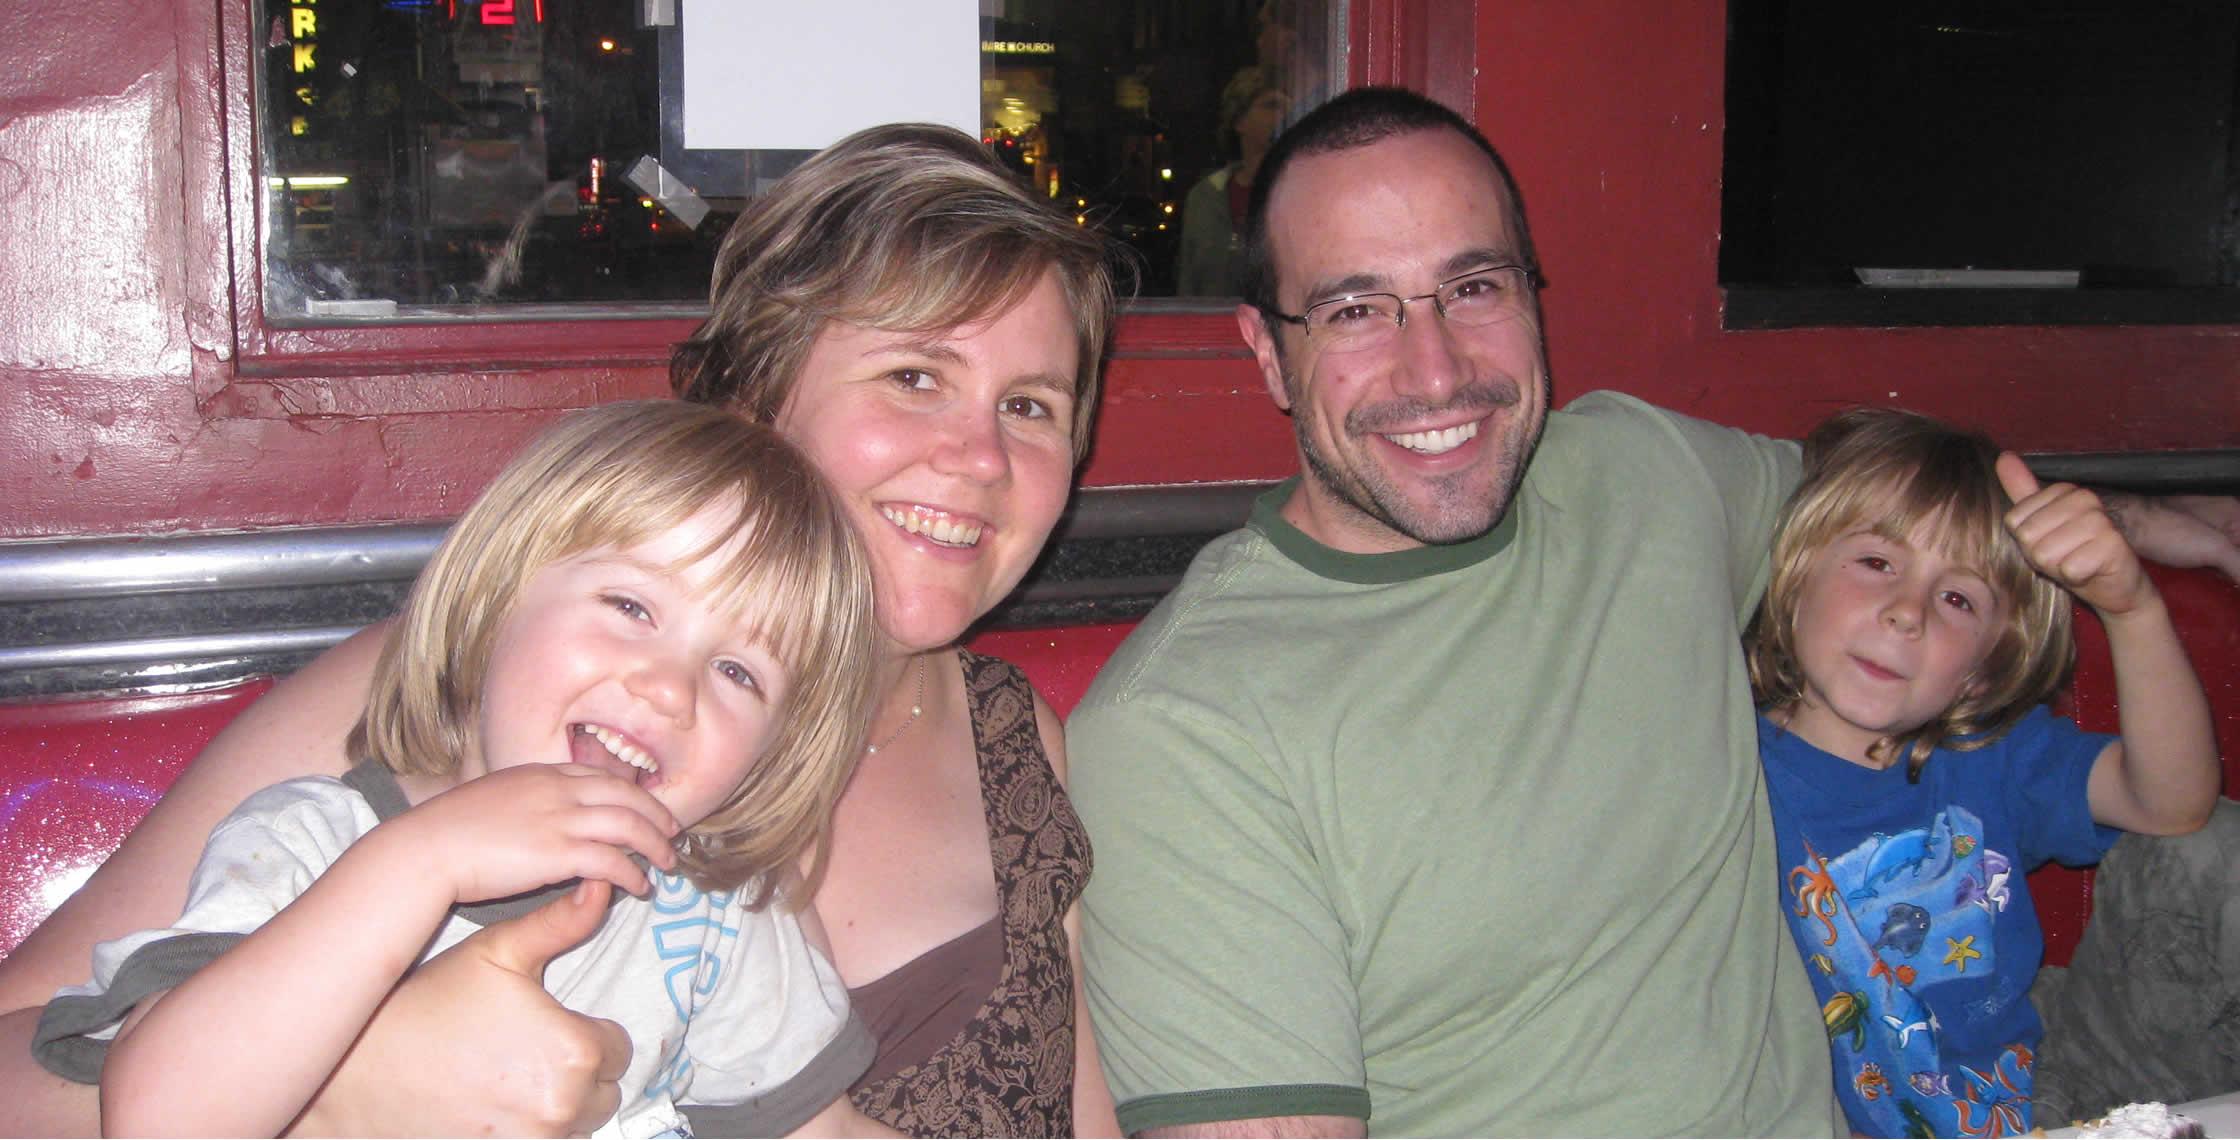 Ben Nadel at Ellen's Stardust Diner (New York City) with: Colin Silverberg, Carol Loffelmann, and Daniel Silverberg